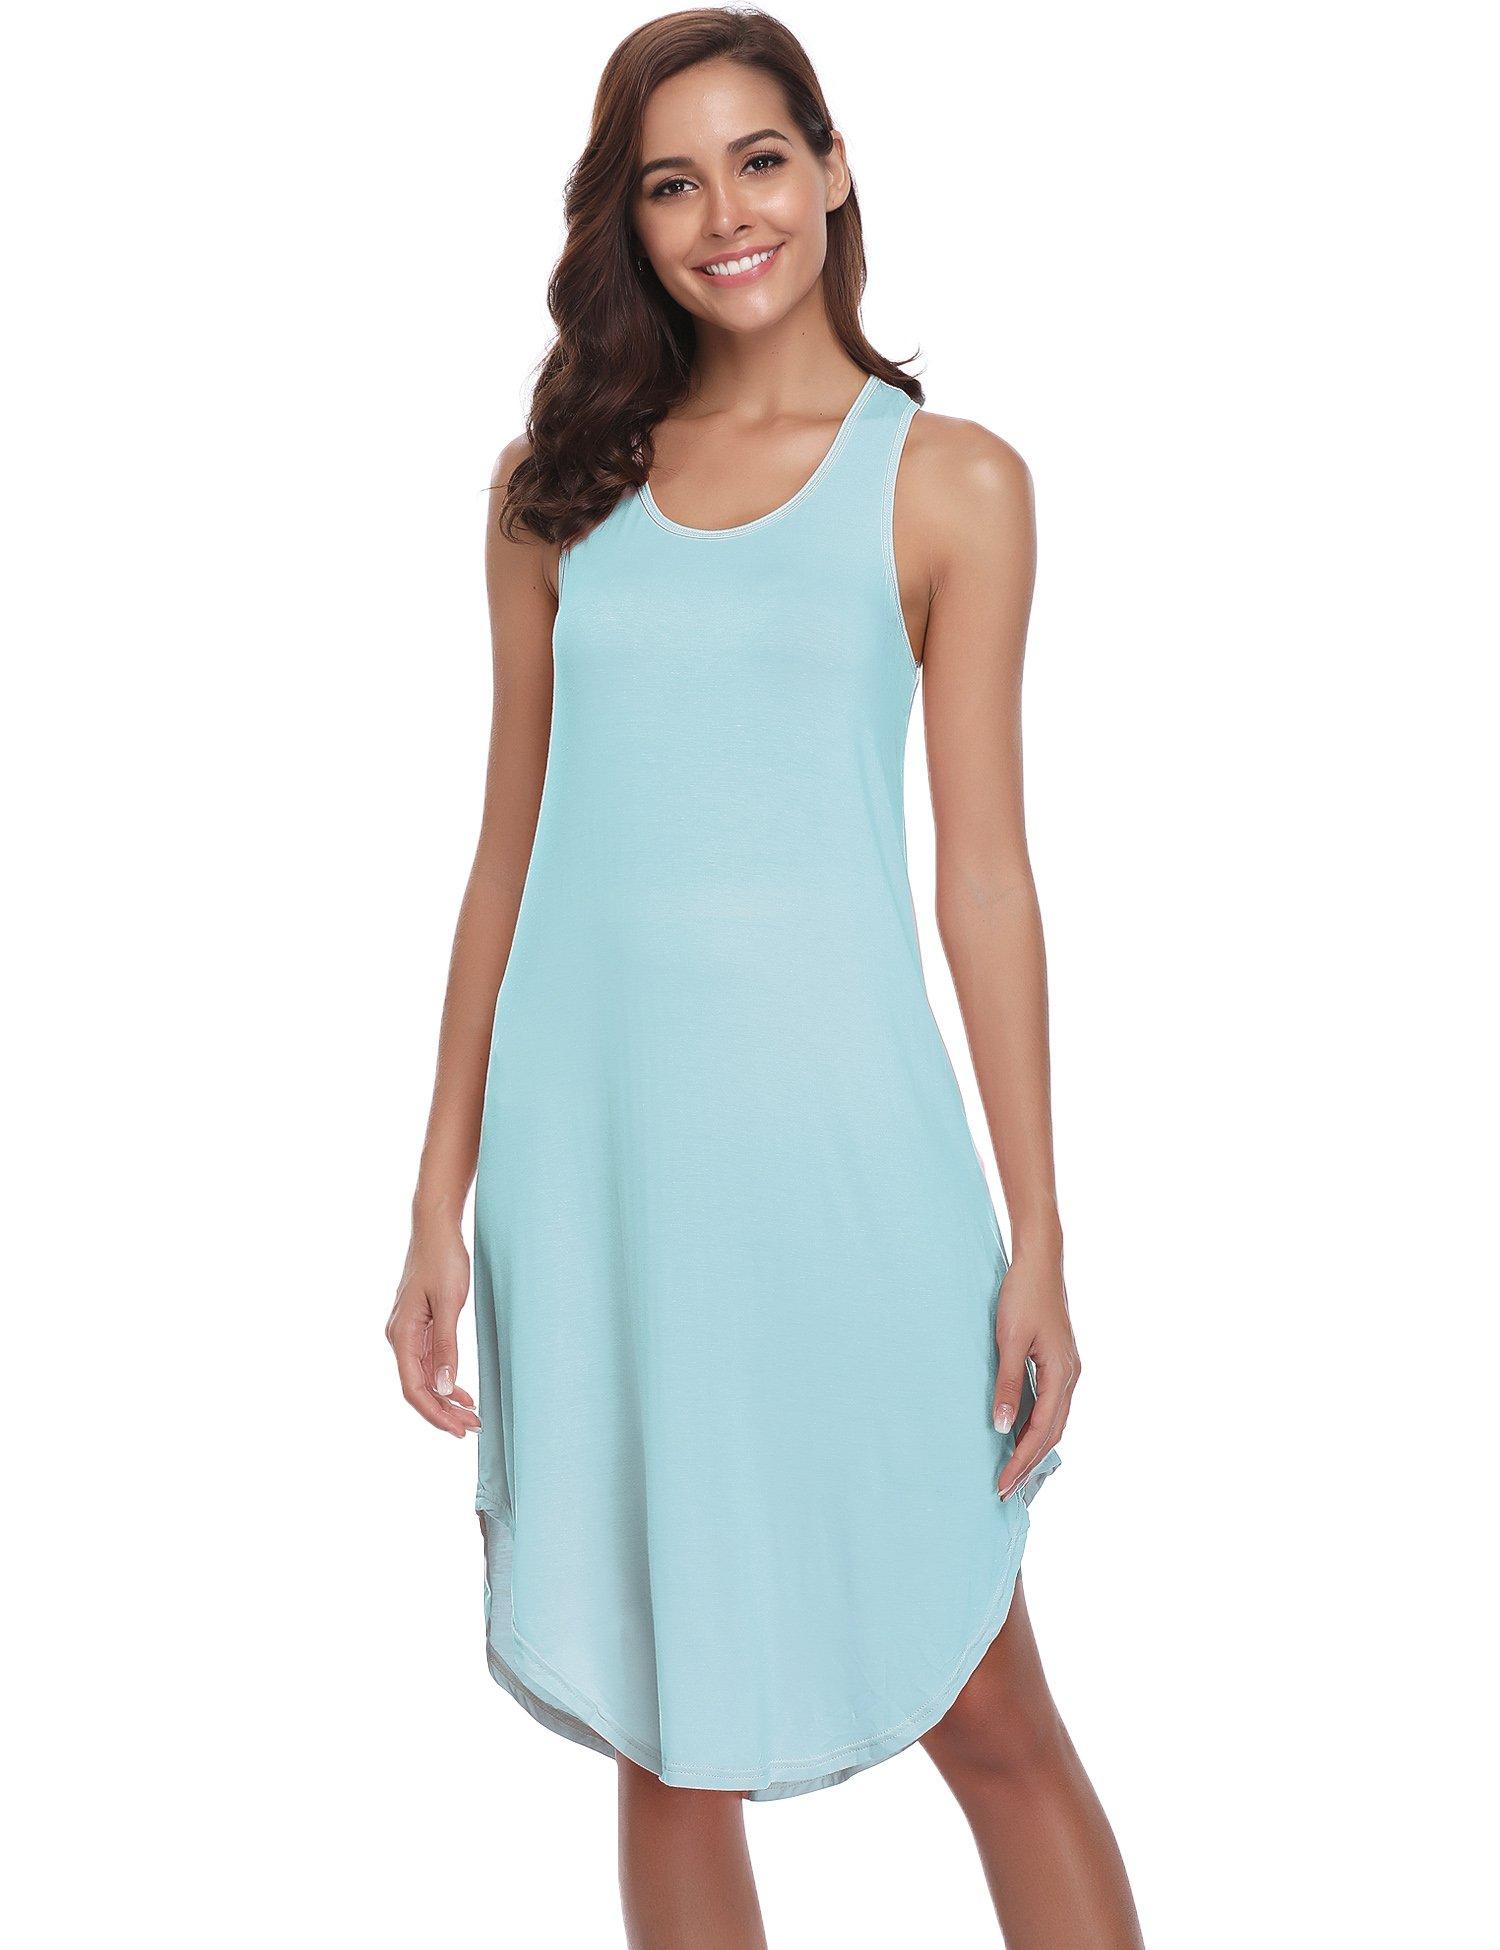 Aibrou Women's Cotton Nightgown Sleeveless Racerback Nightshirt Dress Sleepwear (Light Blue, Medium)